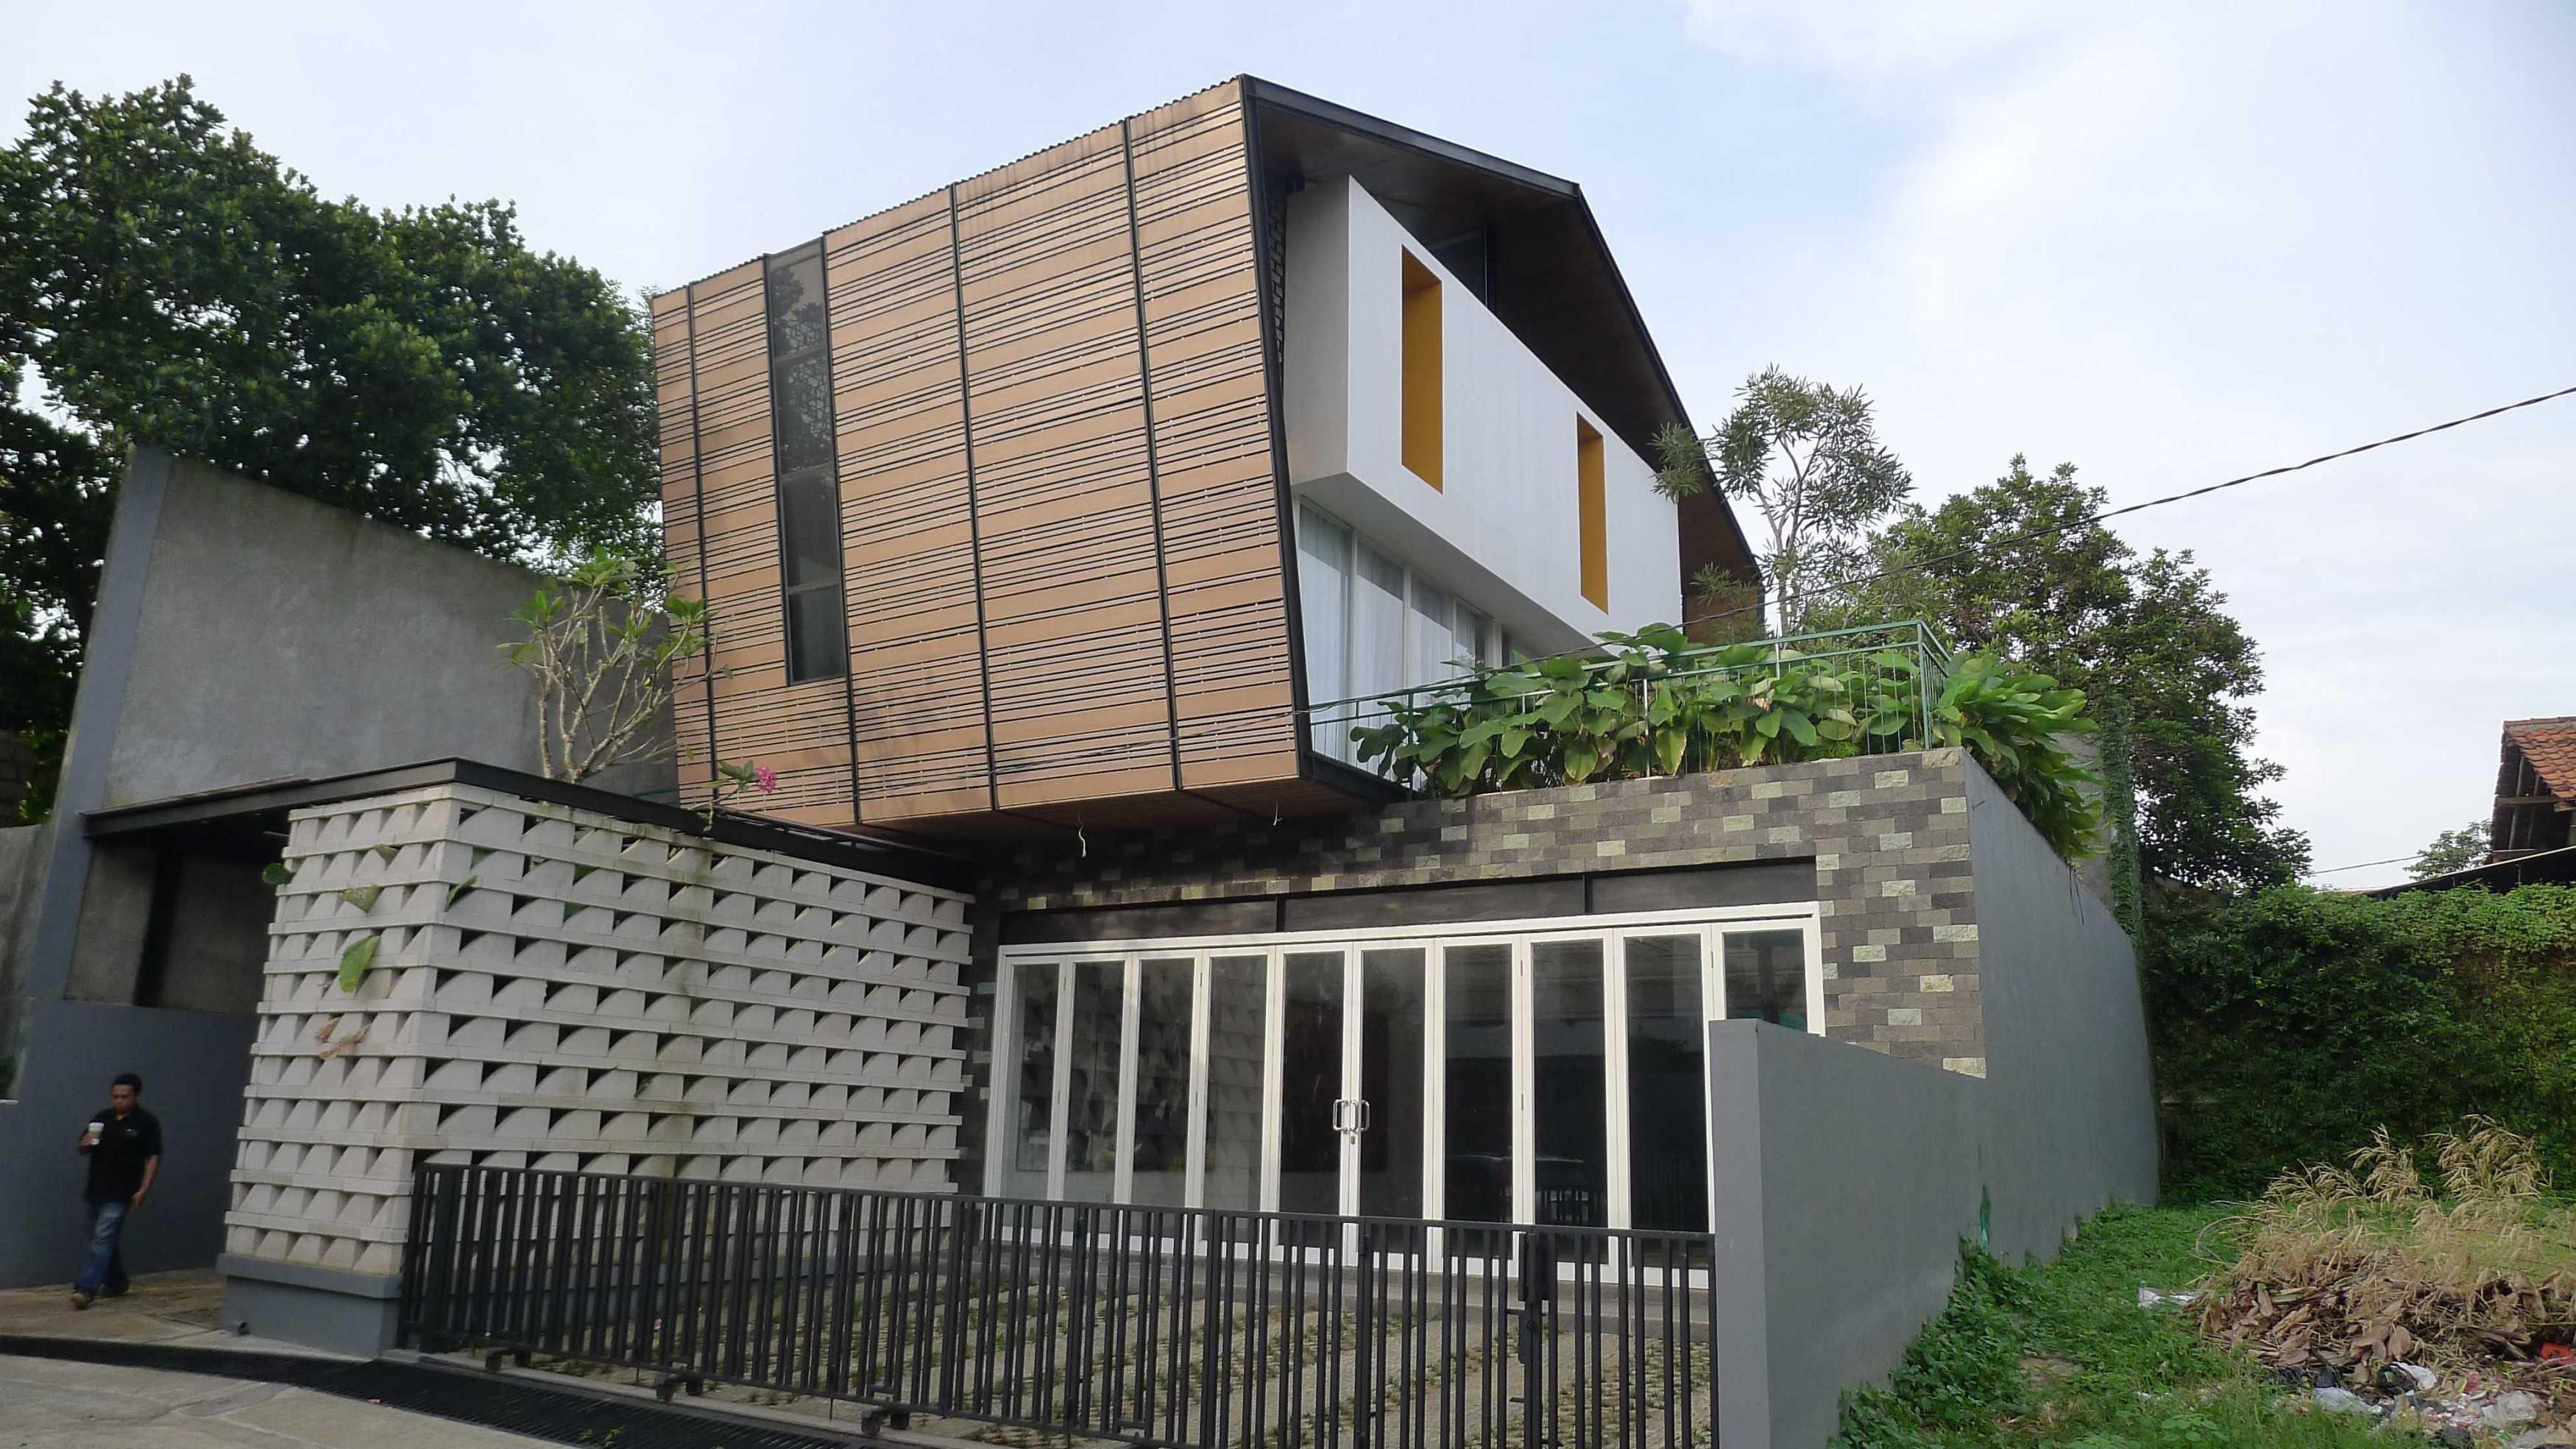 Parametr Indonesia Hybrid House Tangerang, Banten, Indonesia Tangerang, Banten, Indonesia Facade Contemporary  18443